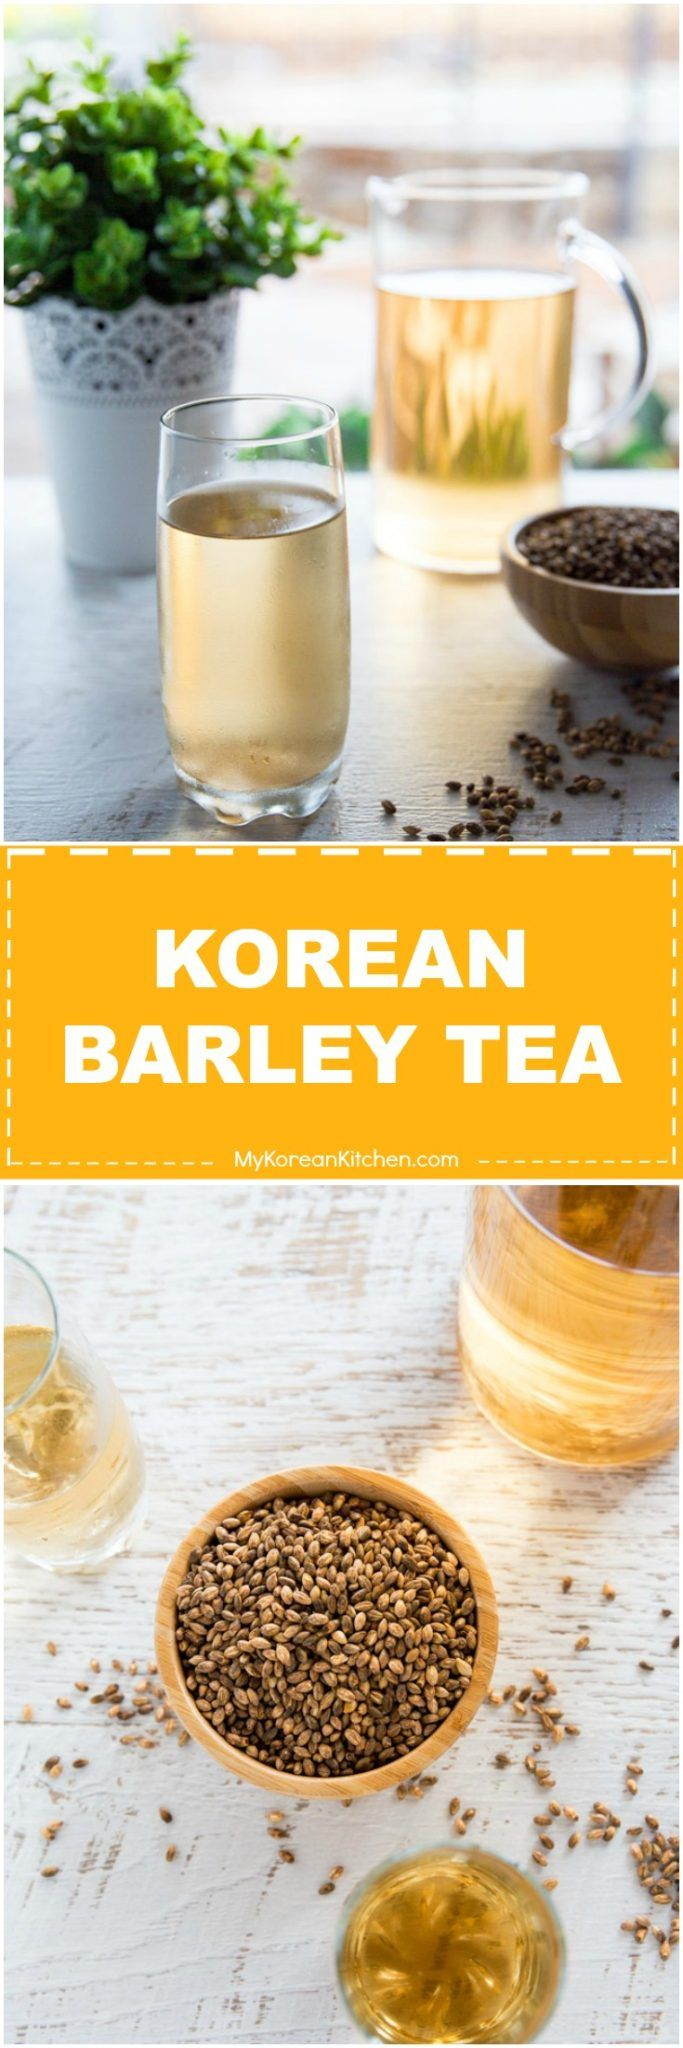 How to make Korean barley tea (boricha). Korean ba…